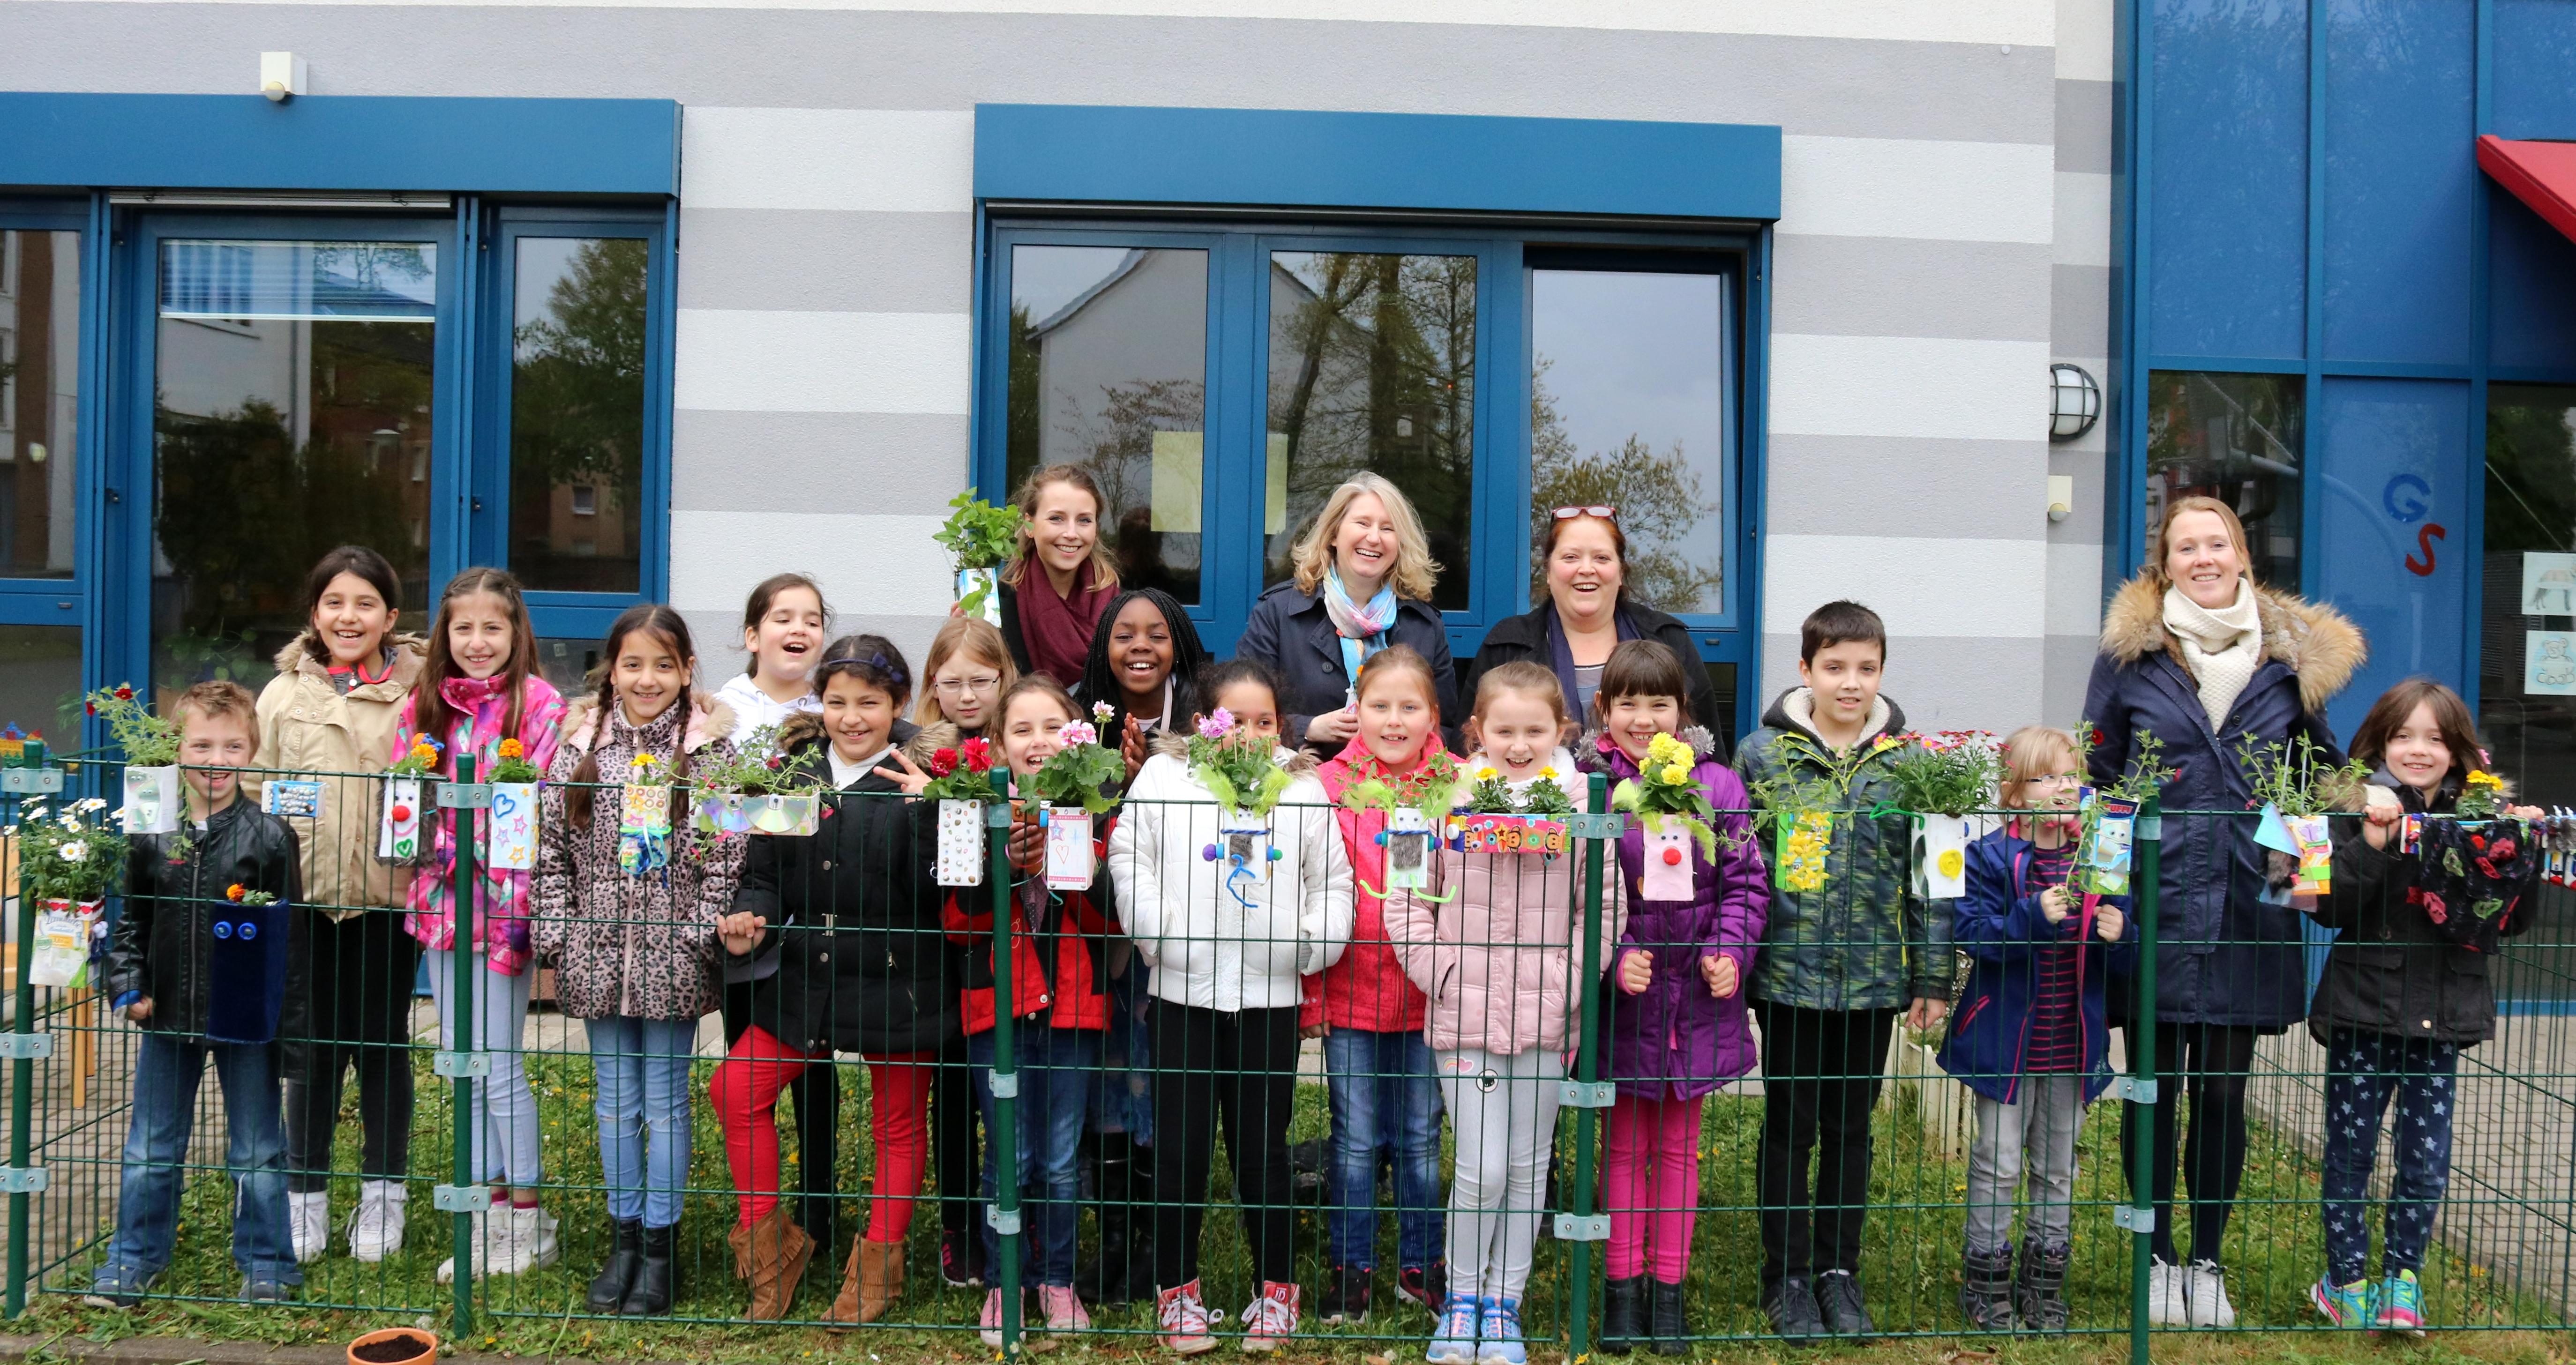 Engagement lernen - Schule an der Rahmstraße - Pflanzaktion (Foto Hendrik Rathmann) (77)